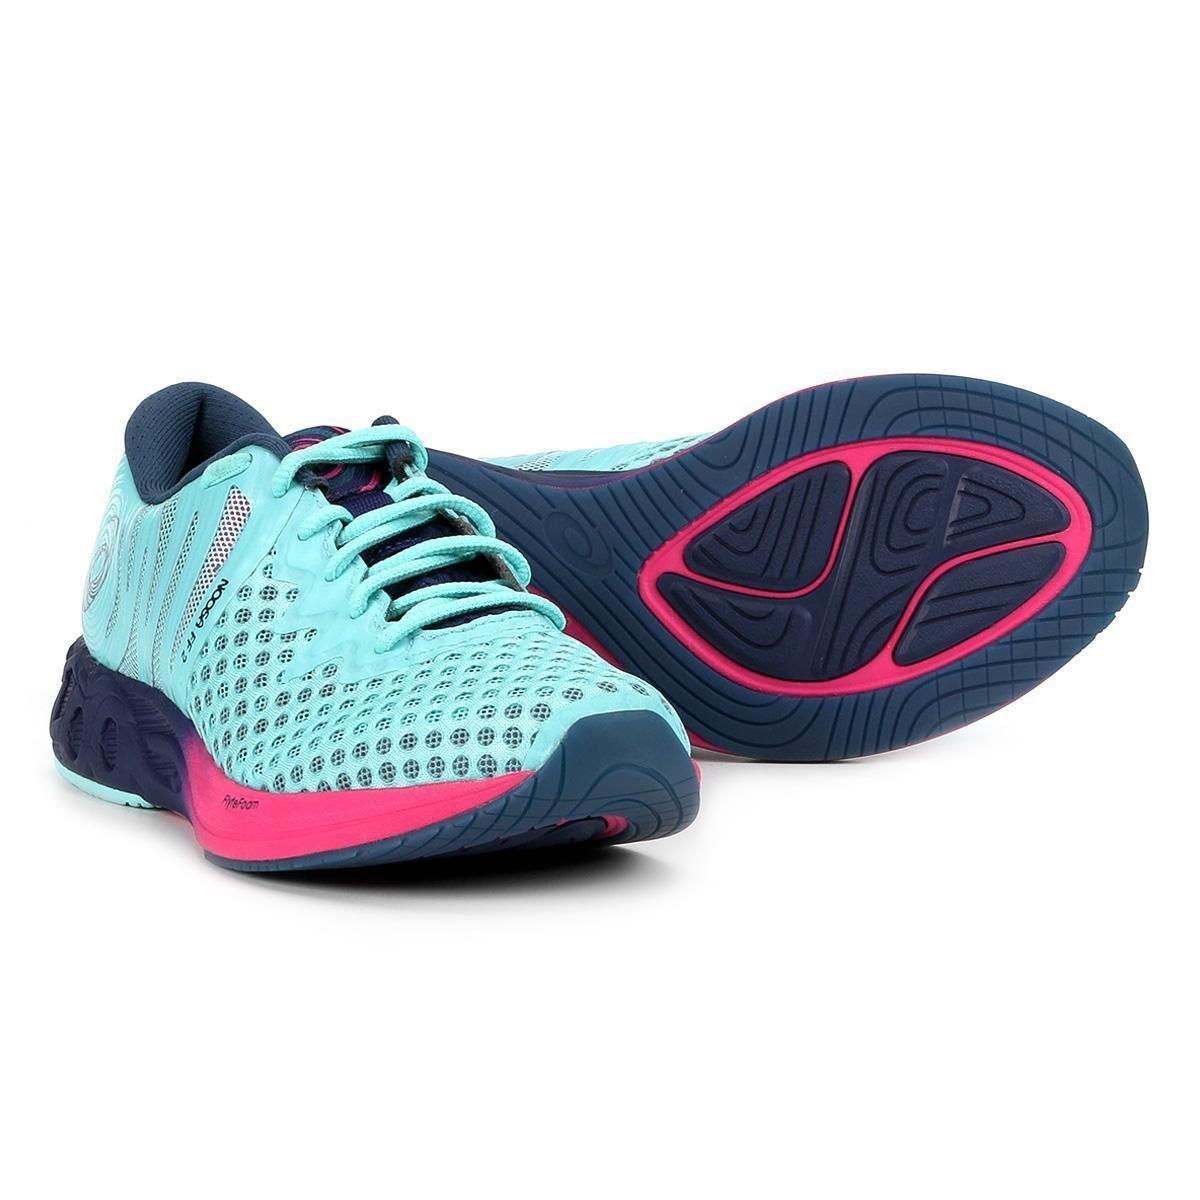 Noosa FF Feminino Azul e Tênis Asics Noosa 2 FF Roxo 2 Tênis Asics qwHYBfY  ... 9c627383730d7